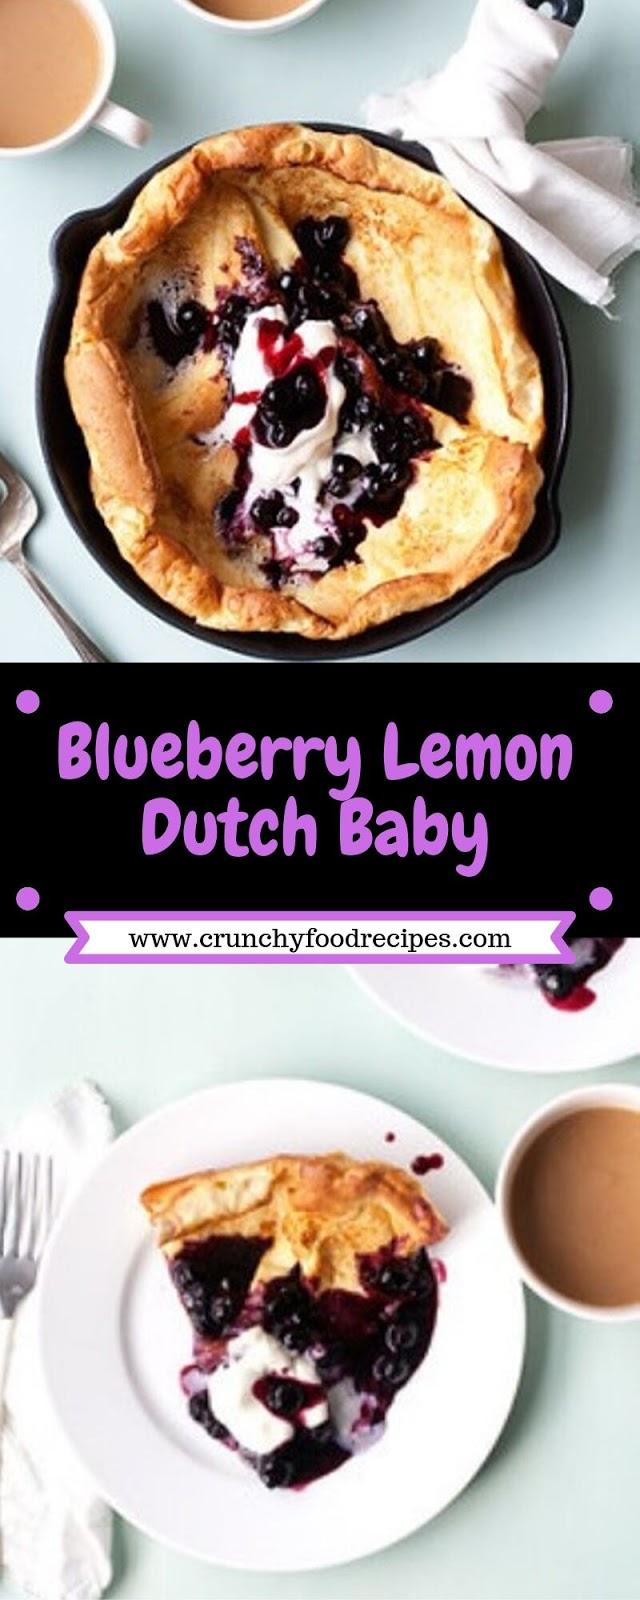 Blueberry Lemon Dutch Baby